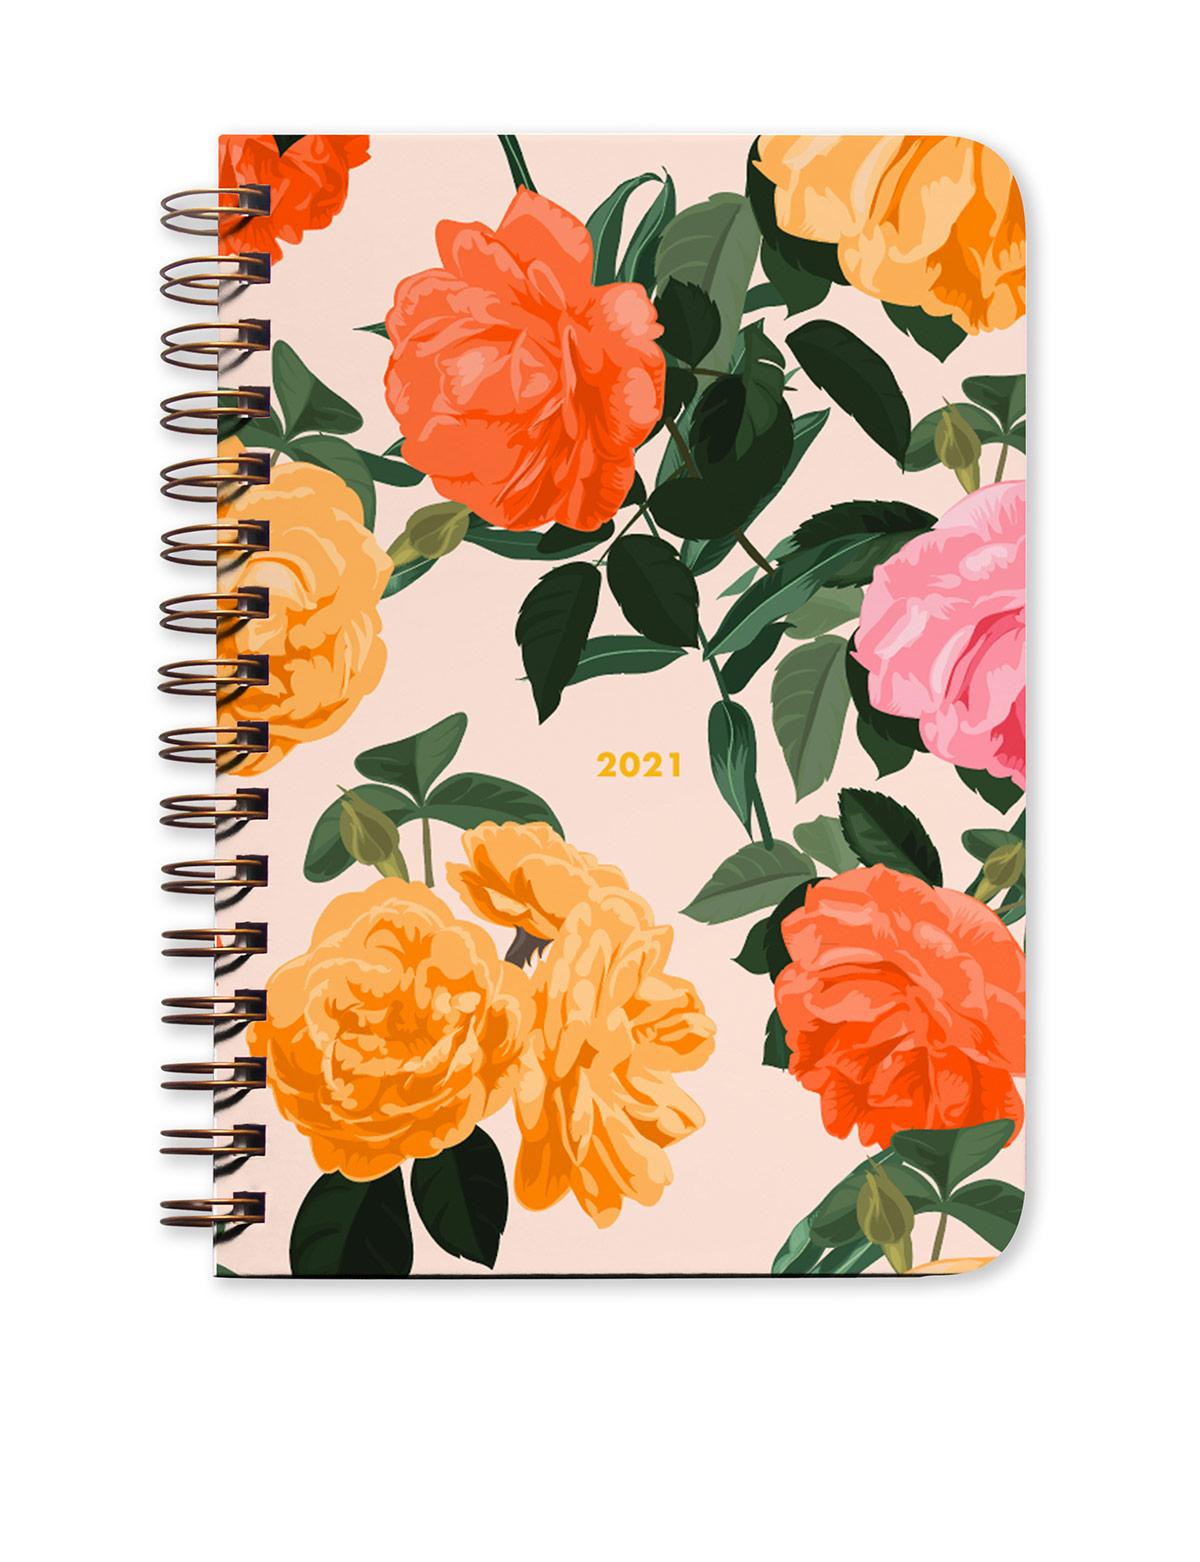 Rose Garden 2021 Agenda - Monthly Planner